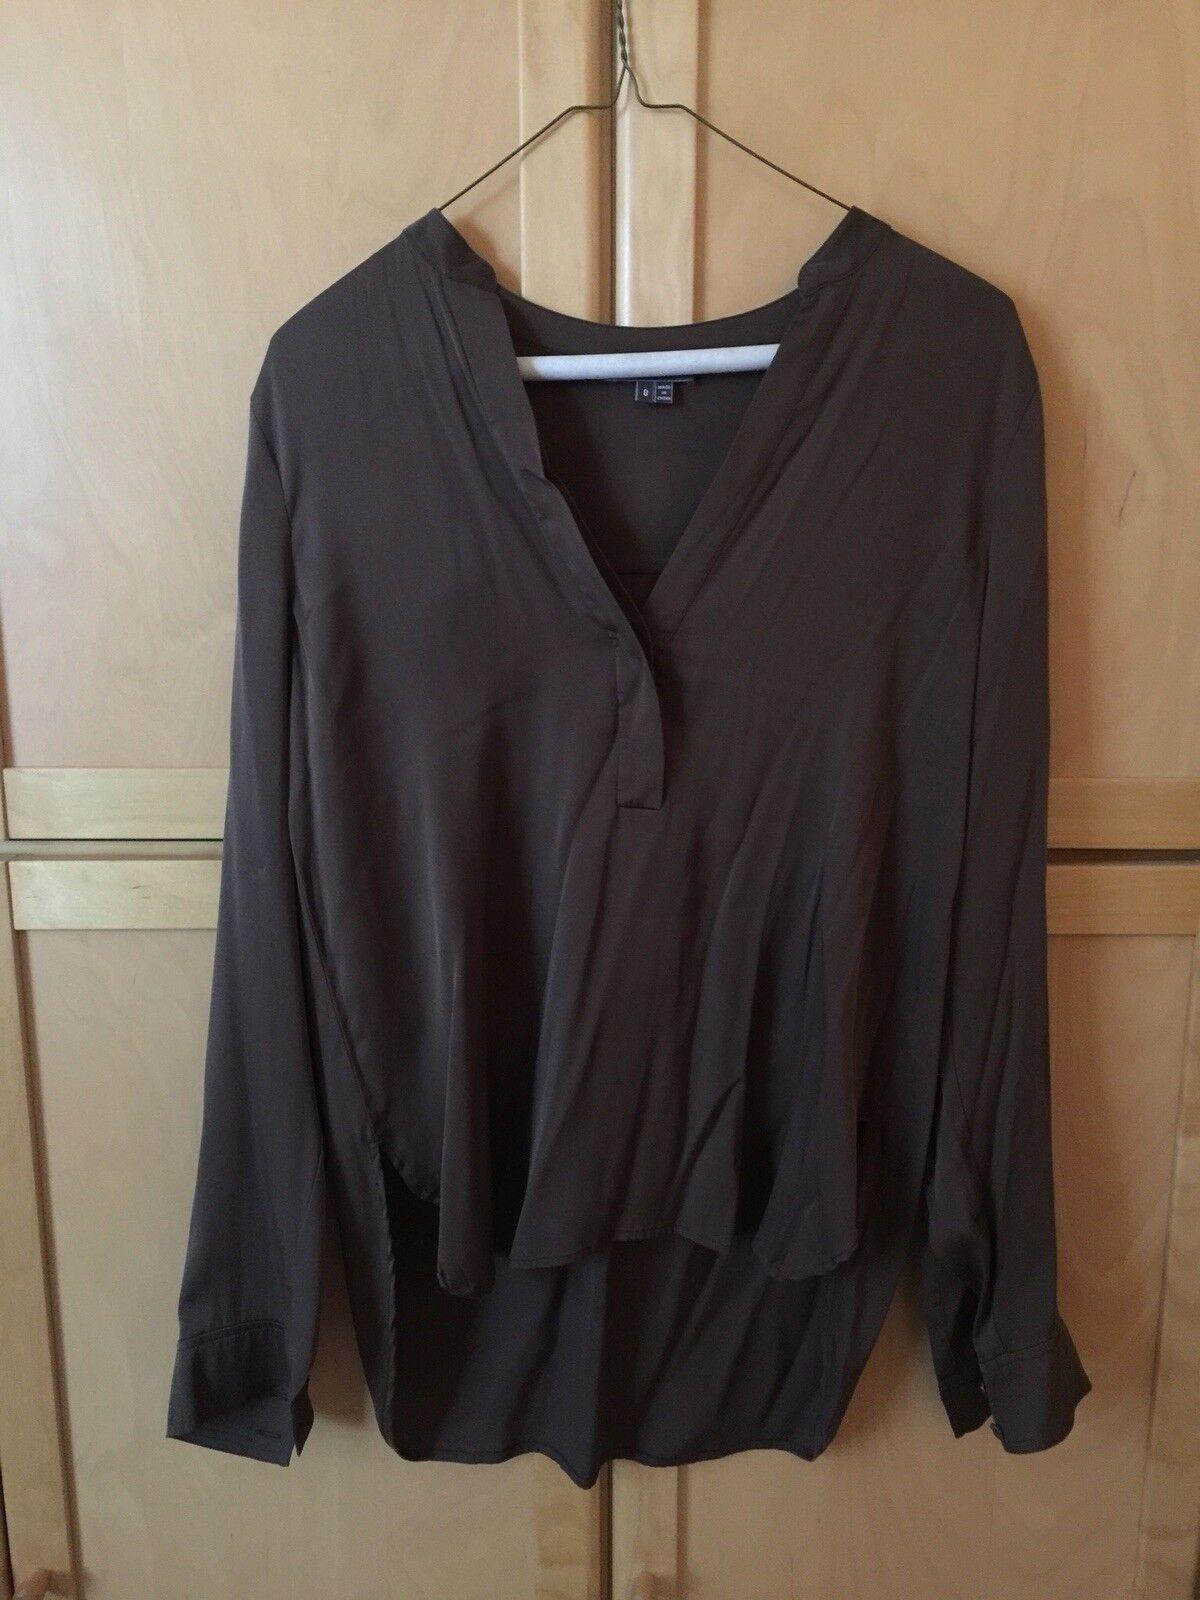 Vince braun Woman's Größe 8 braun Silk Blouse